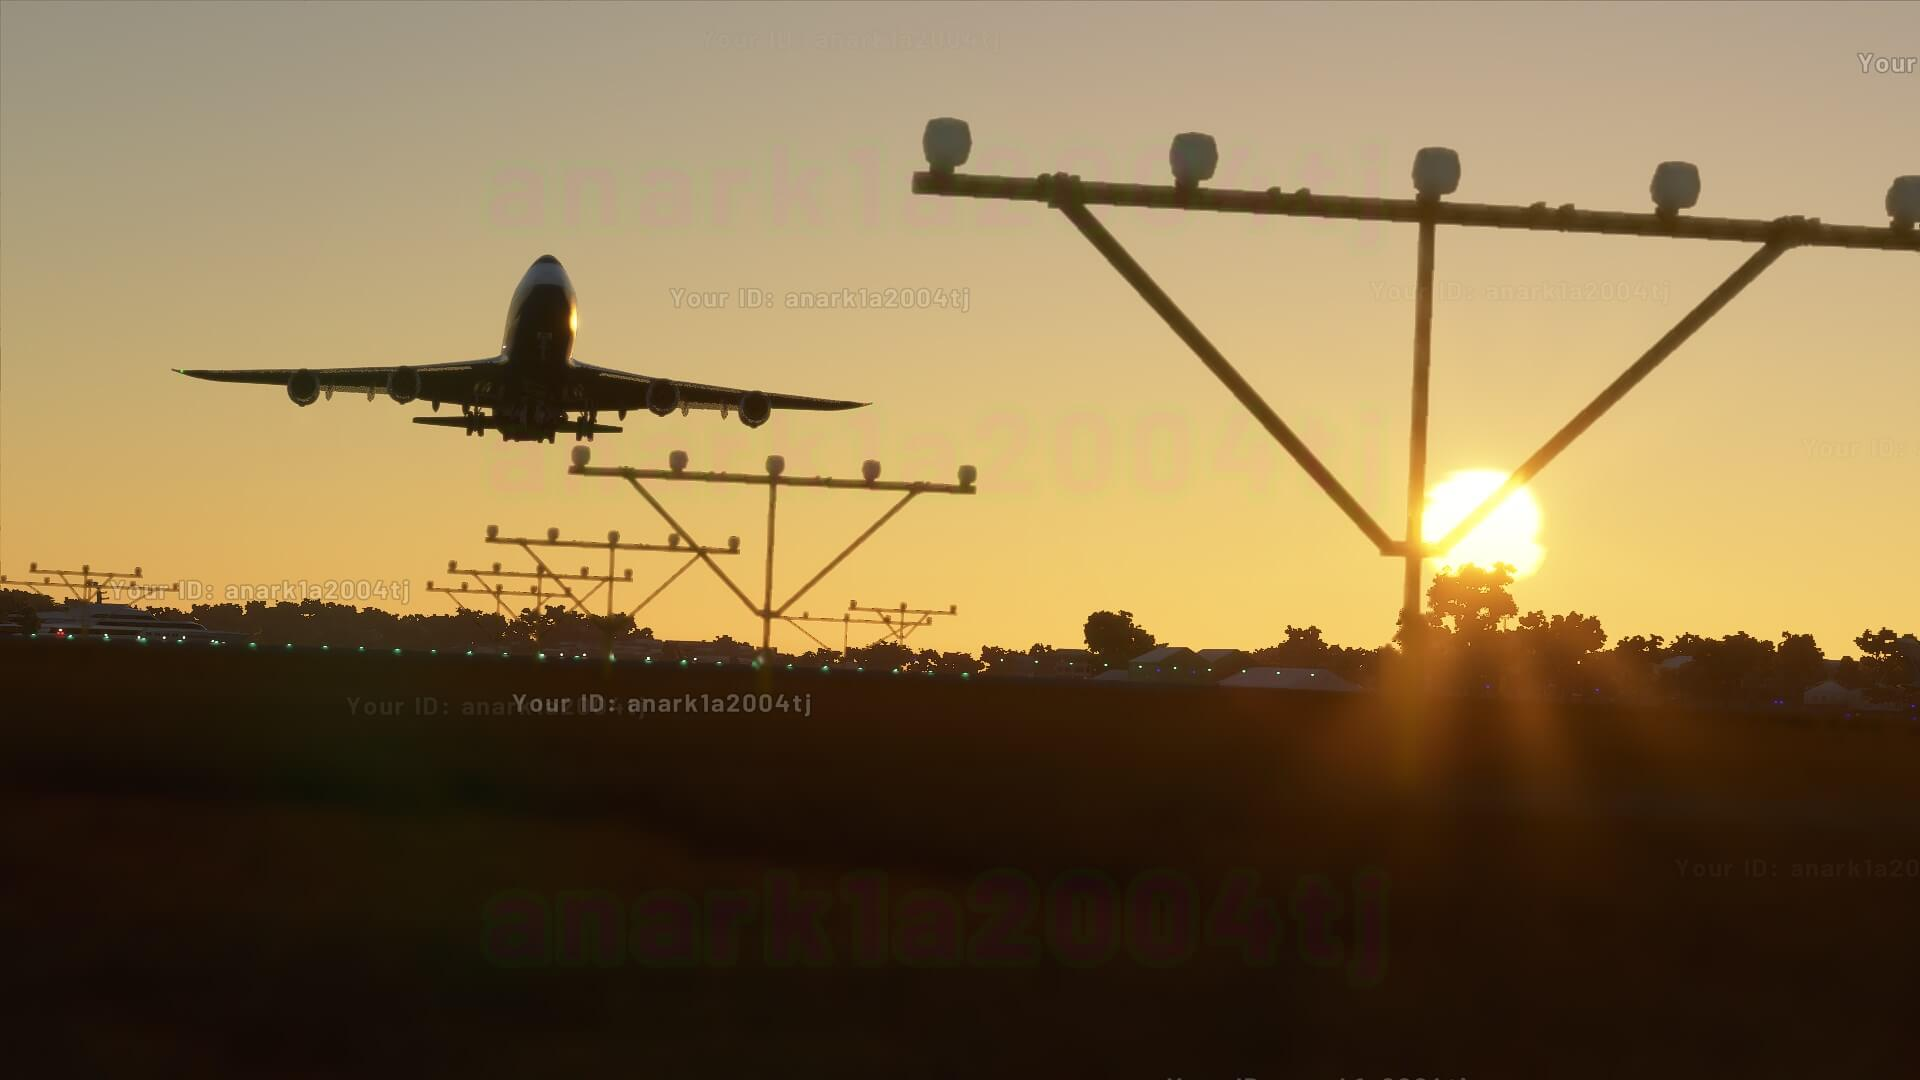 FlightSimulator_rG9xFIgYkV.jpg